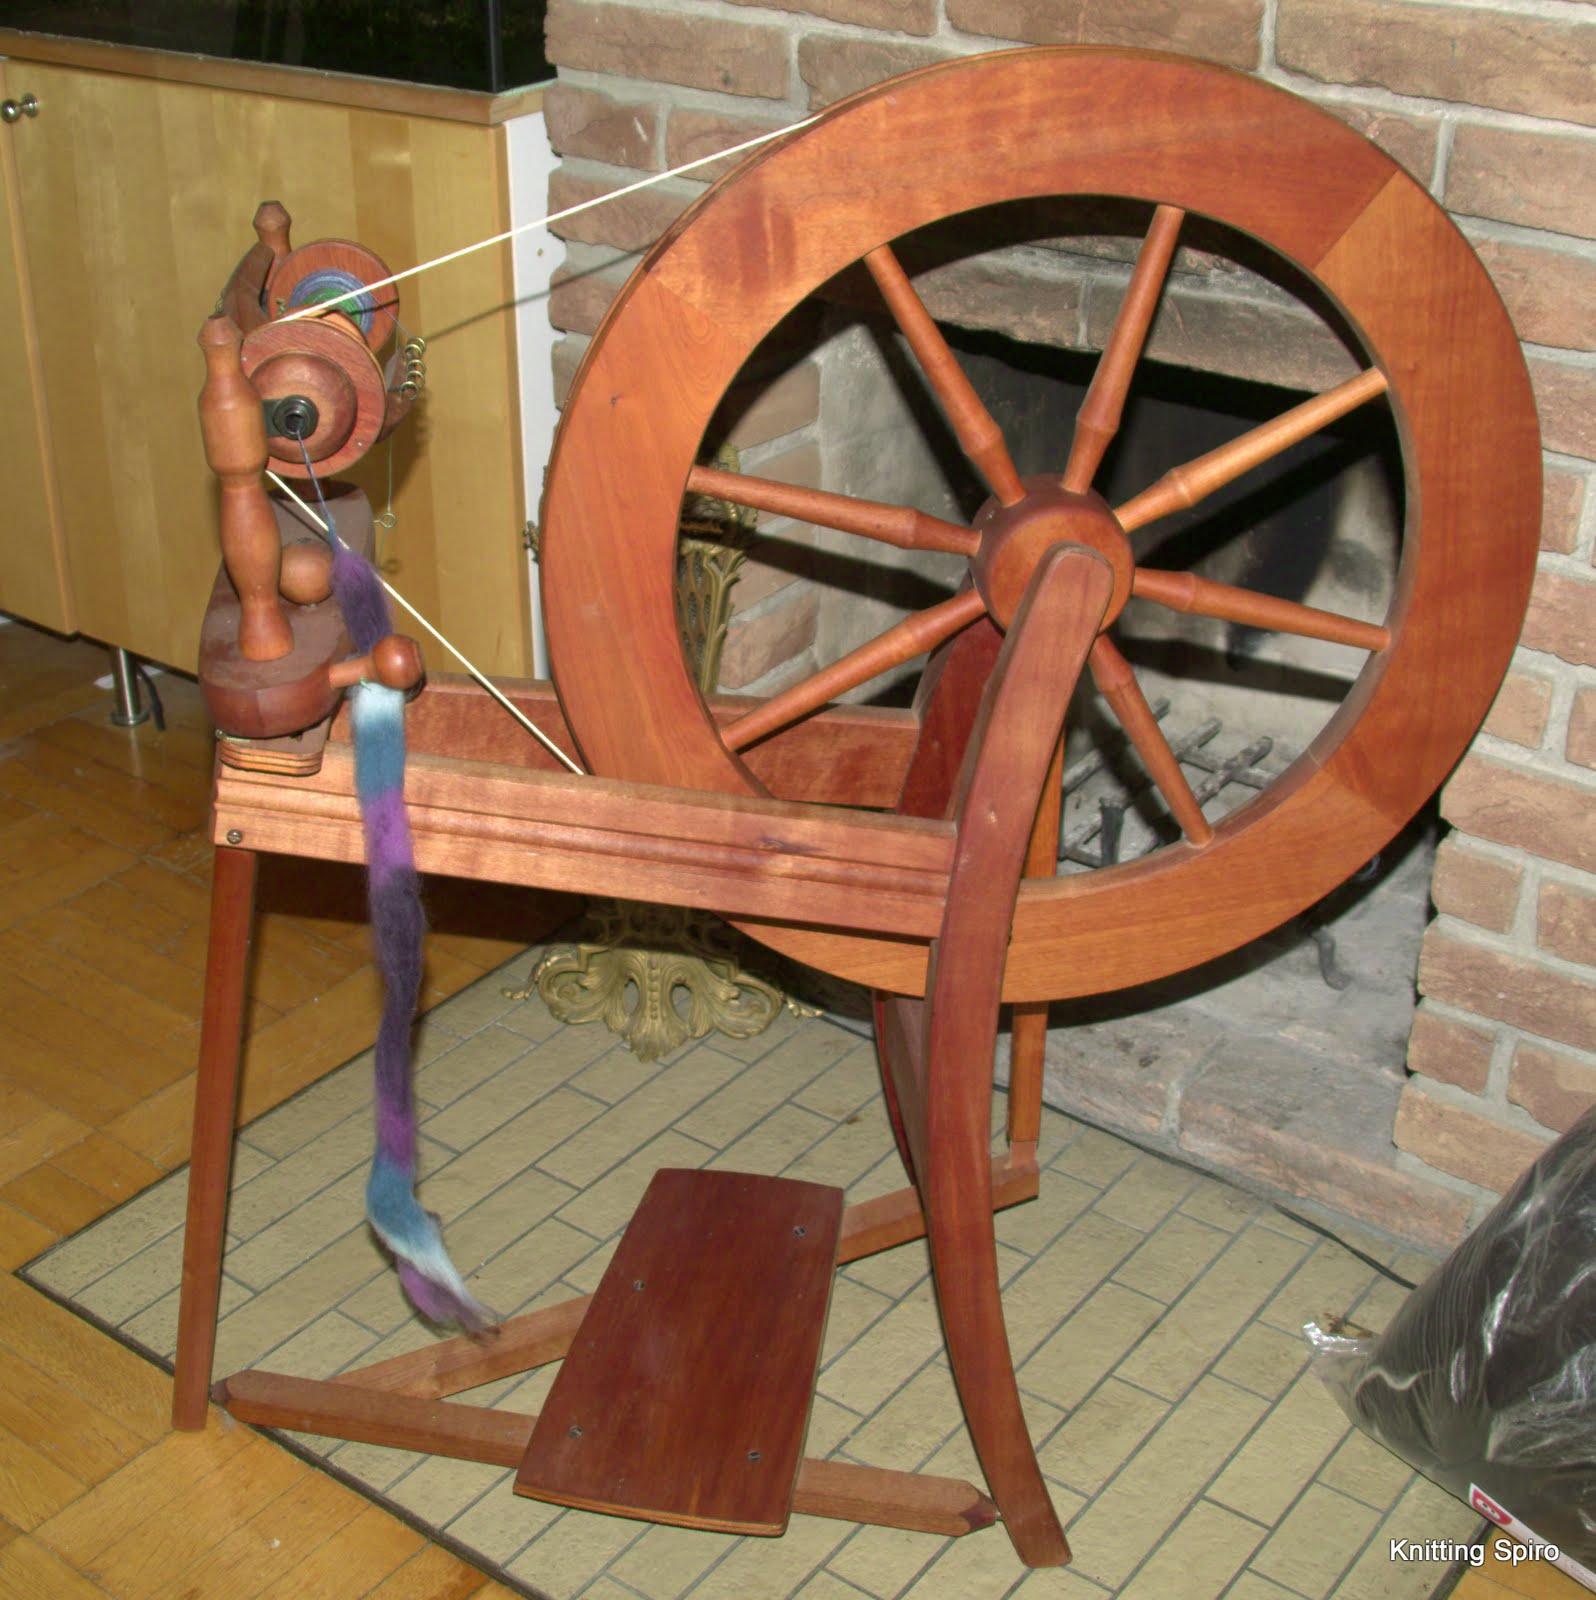 knitting spiro september 2010. Black Bedroom Furniture Sets. Home Design Ideas